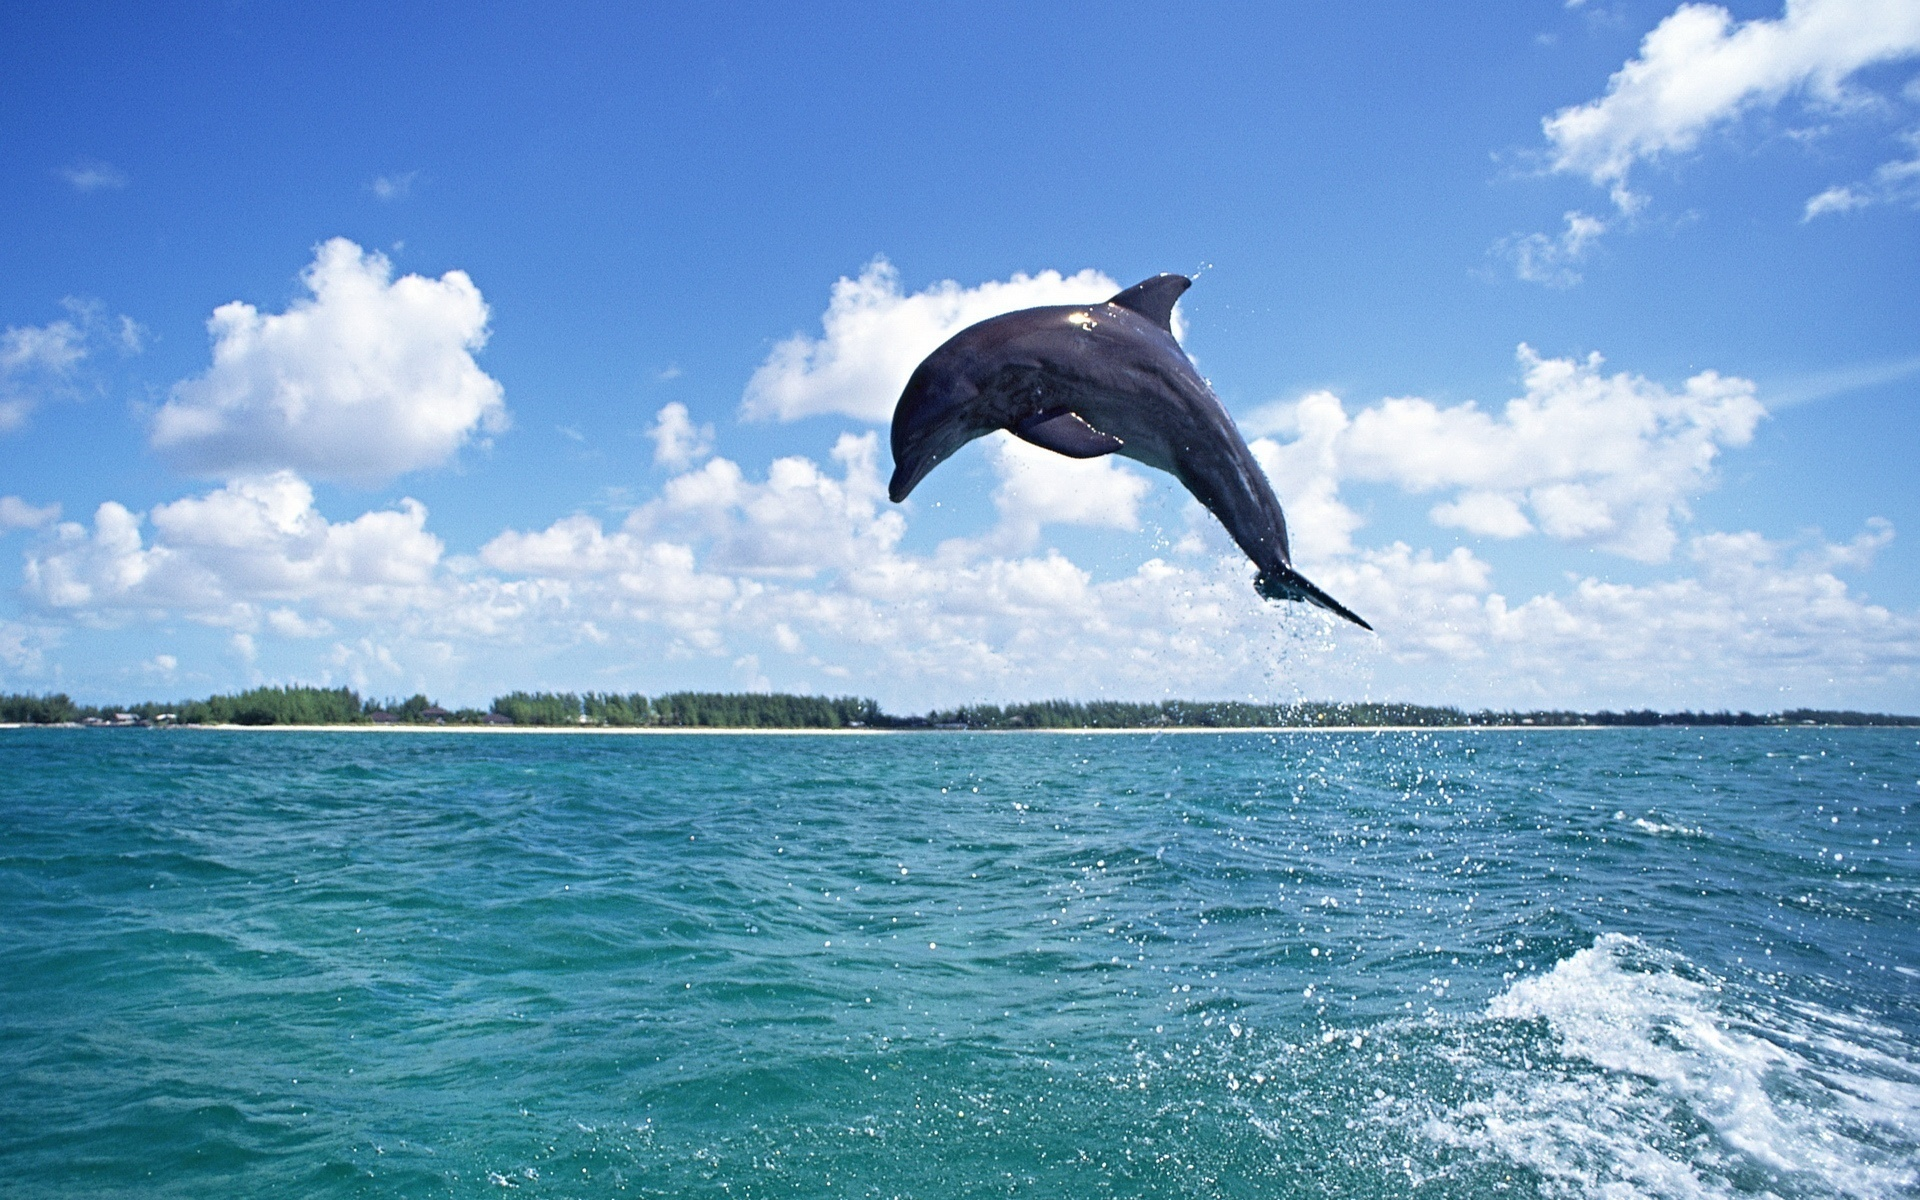 wallpapers dolphin jump sea animals photo 1920x1200 animals 1920x1200